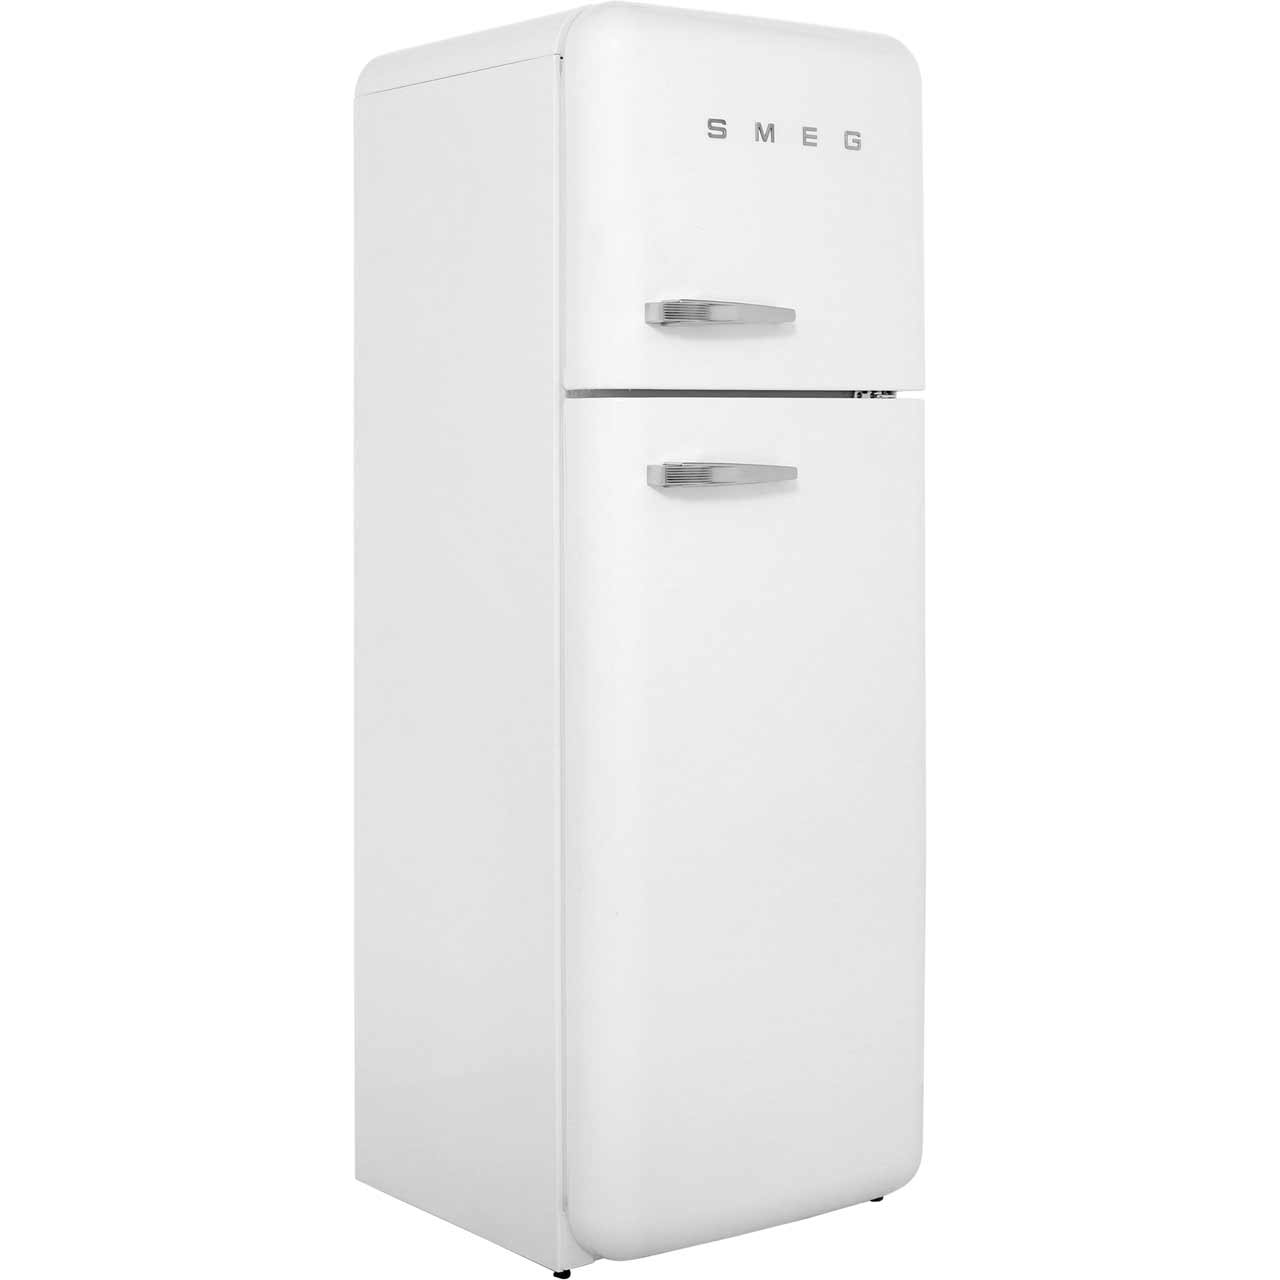 fab30rfw wh smeg fridge freezer retro design. Black Bedroom Furniture Sets. Home Design Ideas